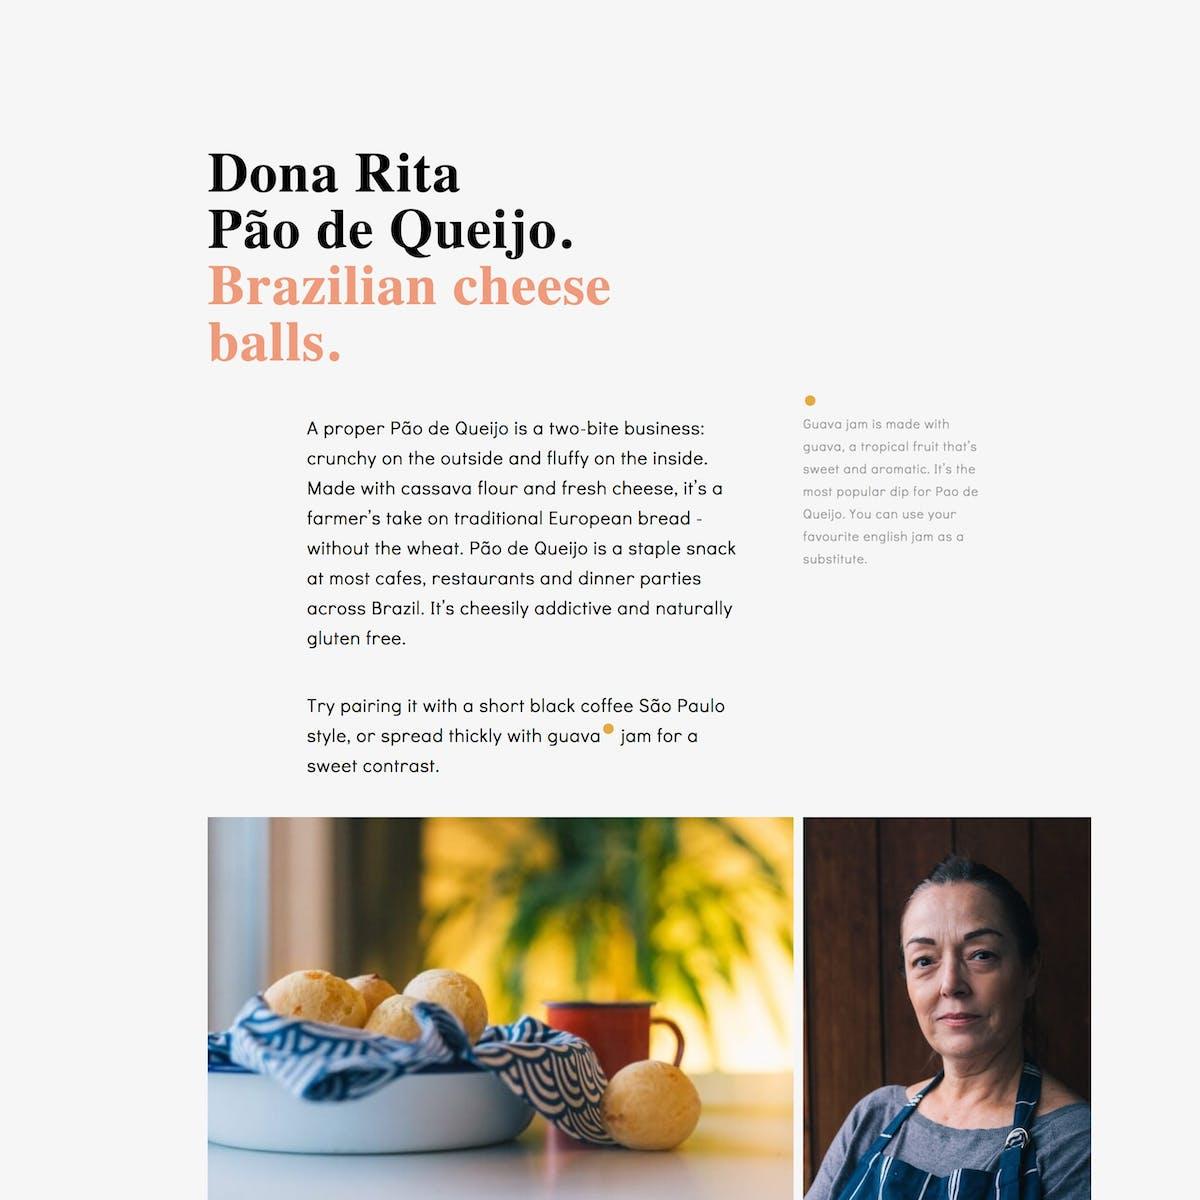 Dona Rita website